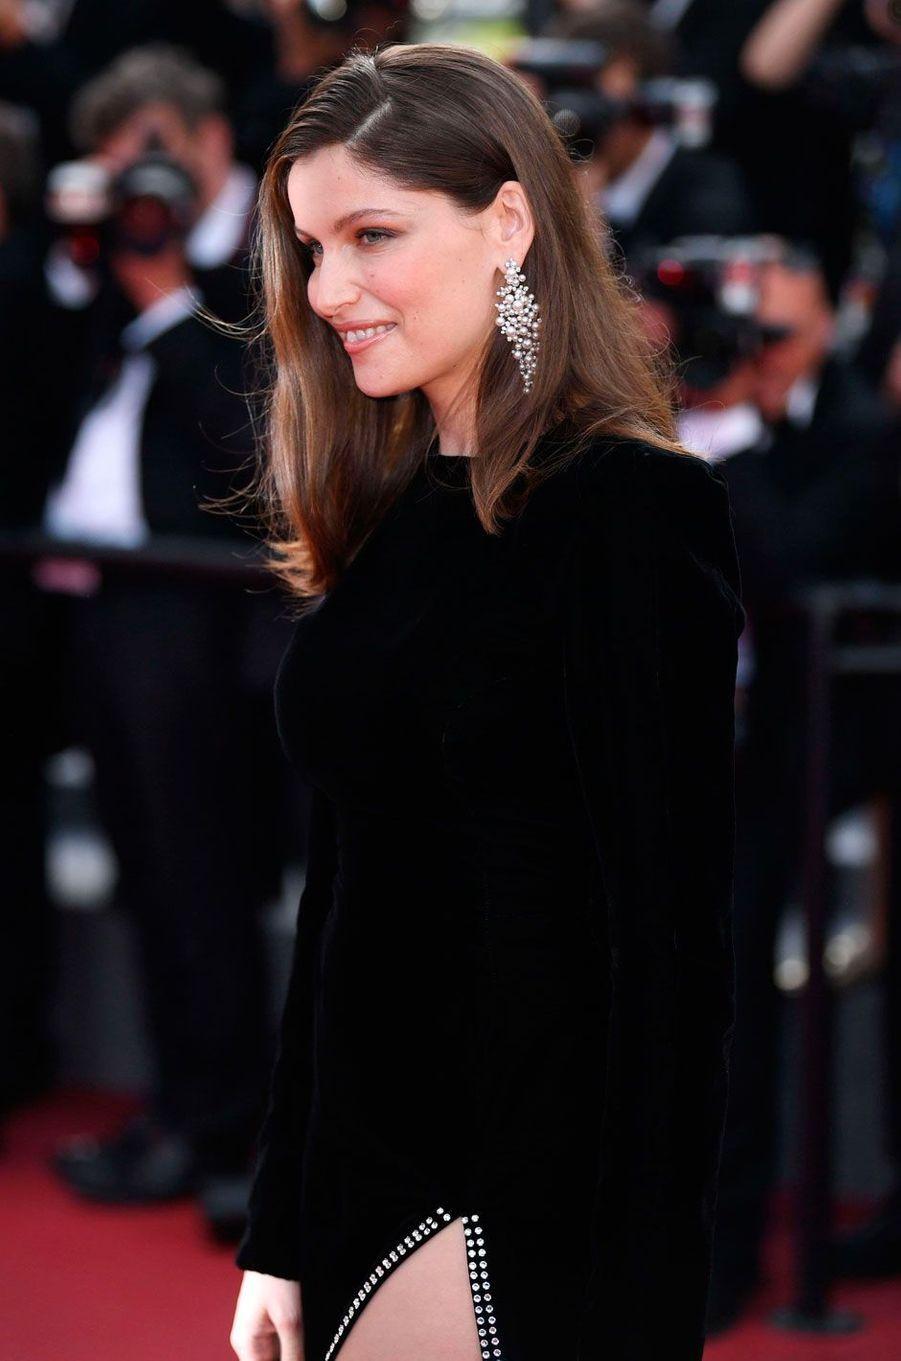 Laetitia Casta au Festival de Cannes 2017